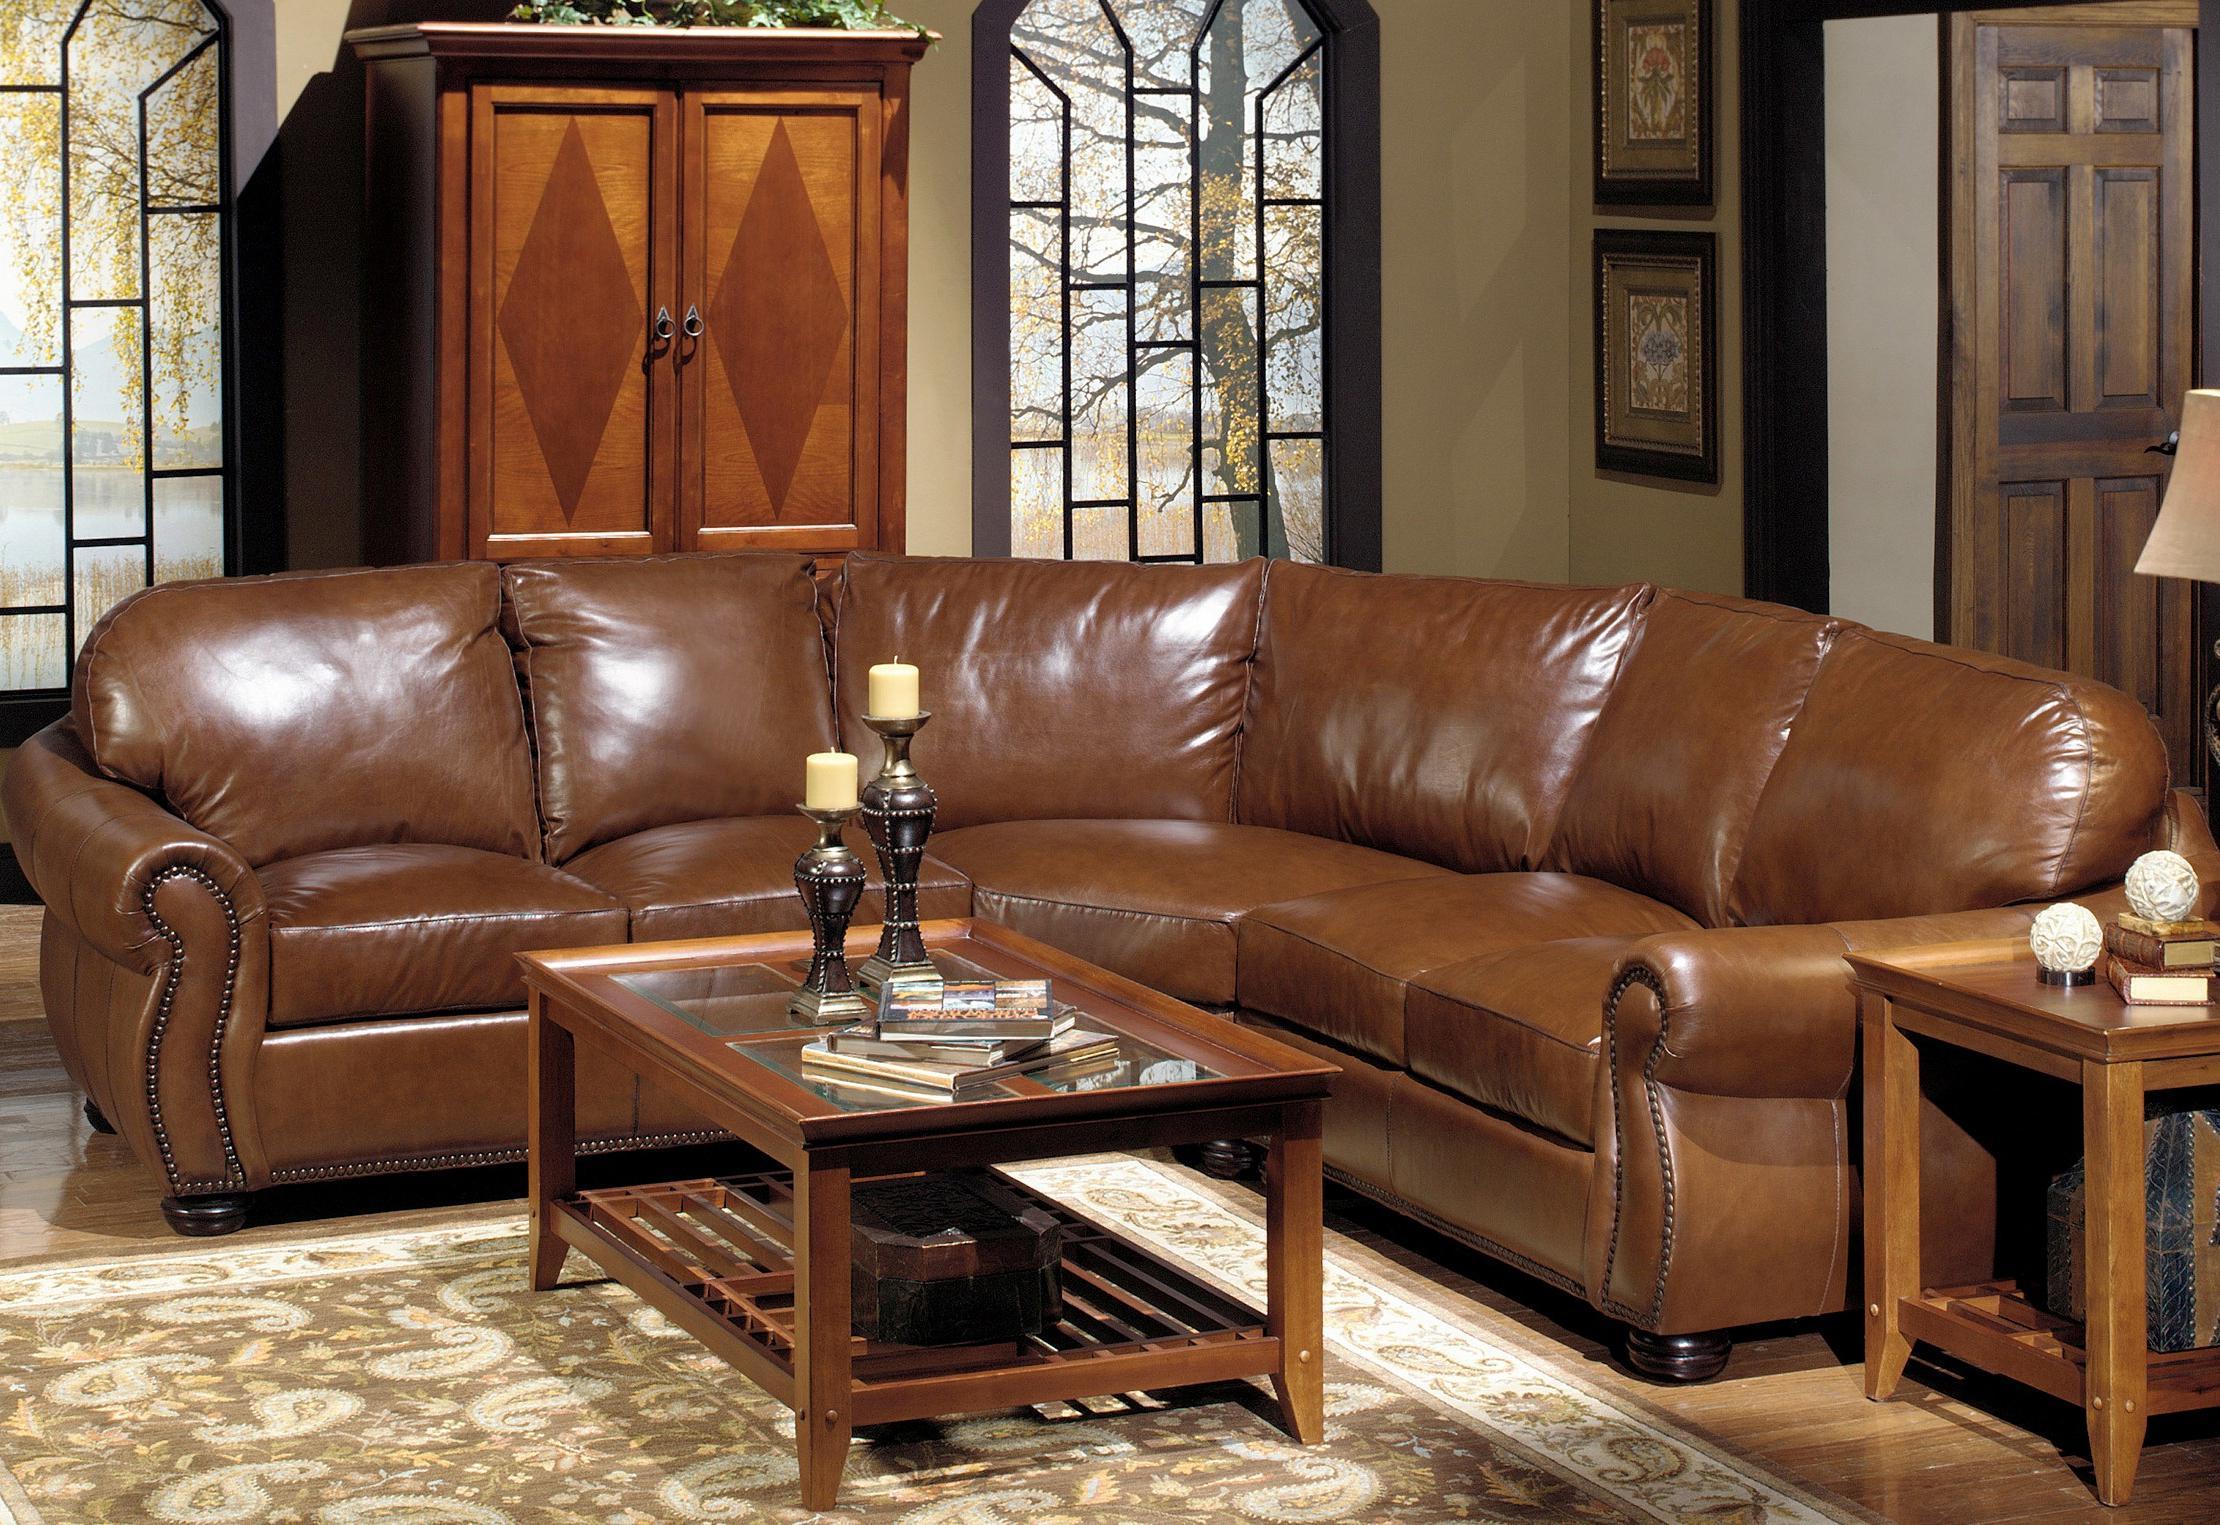 USA Premium Leather 4025 Leather Sectional Sofa With Decorative Nailhead  Trim